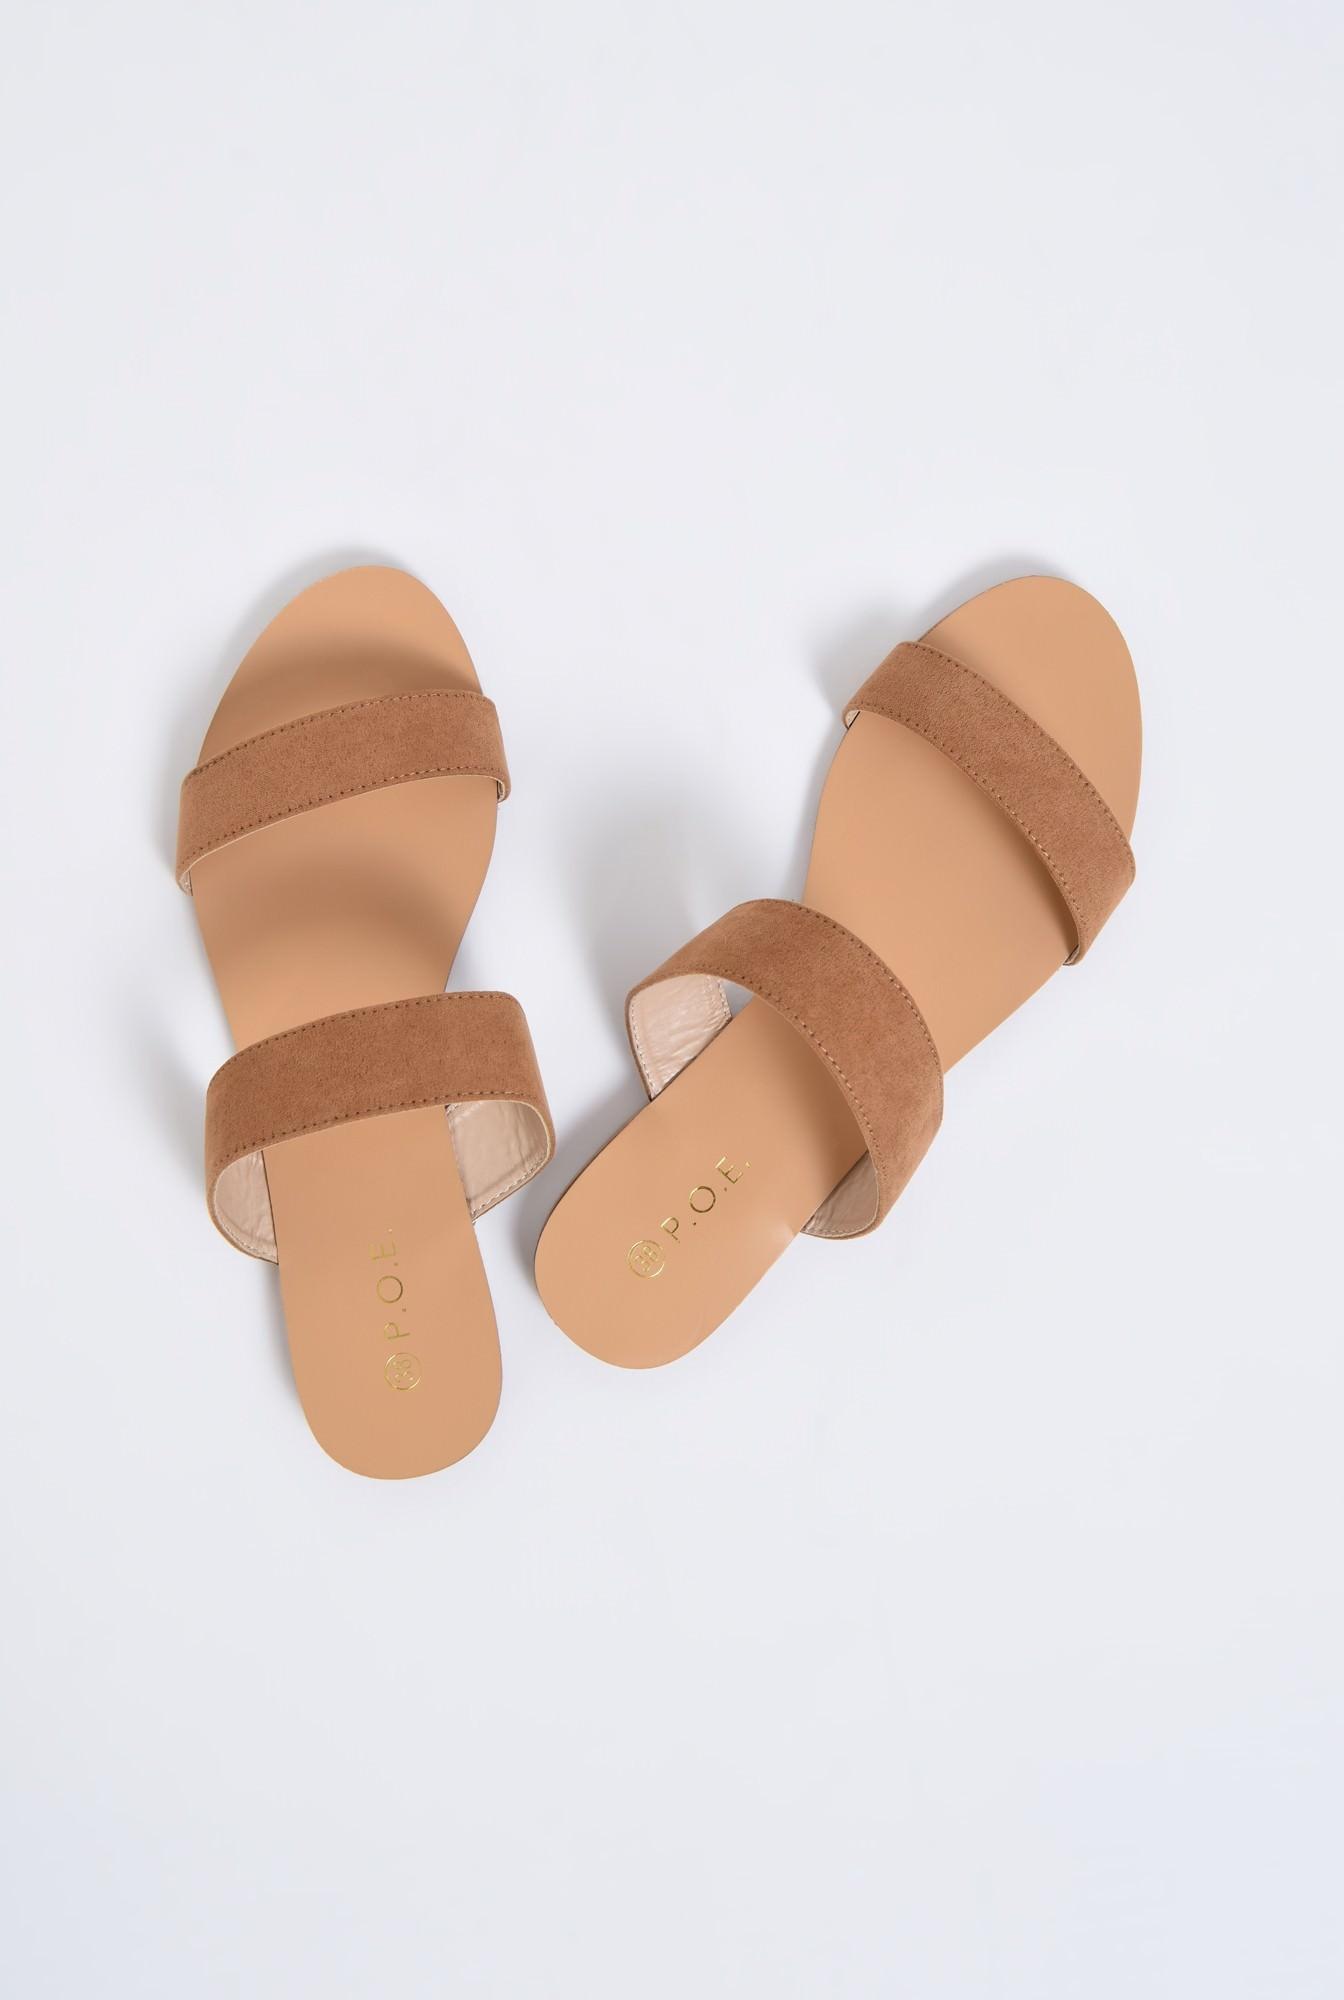 3 - papuci cu talpa joasa, velur, camel, barete late